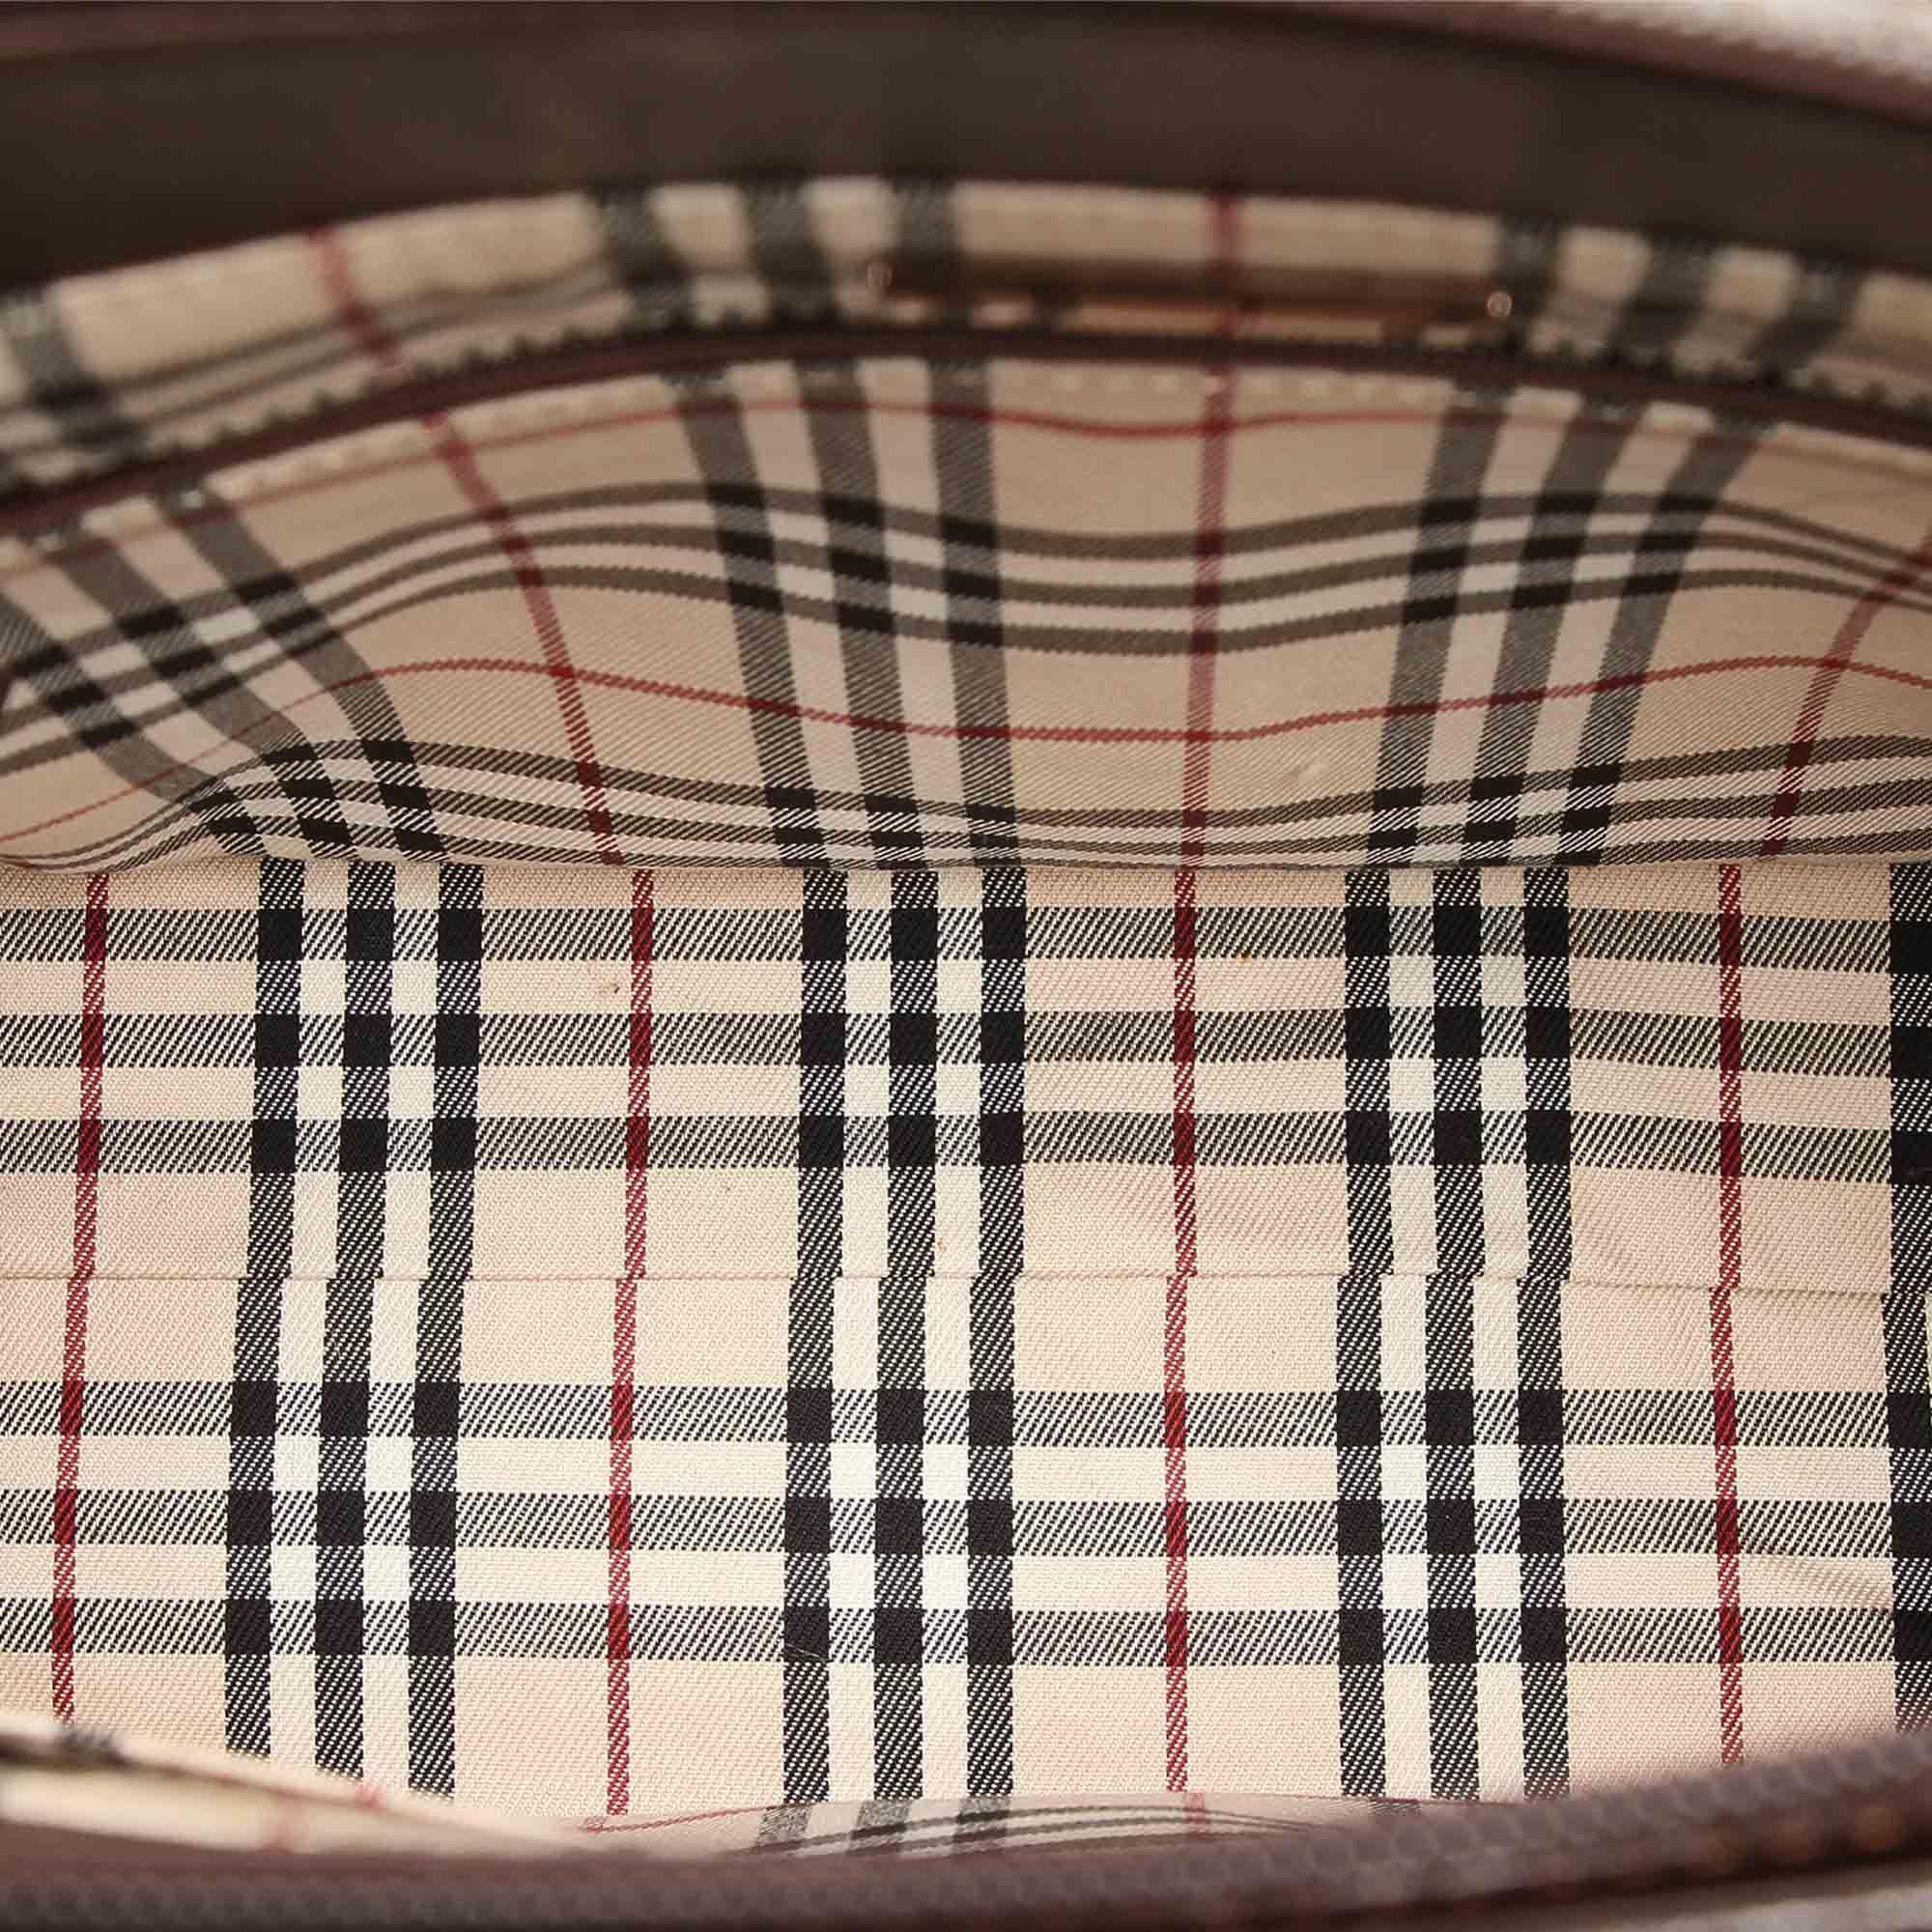 Vintage Burberry Leather Handbag Brown